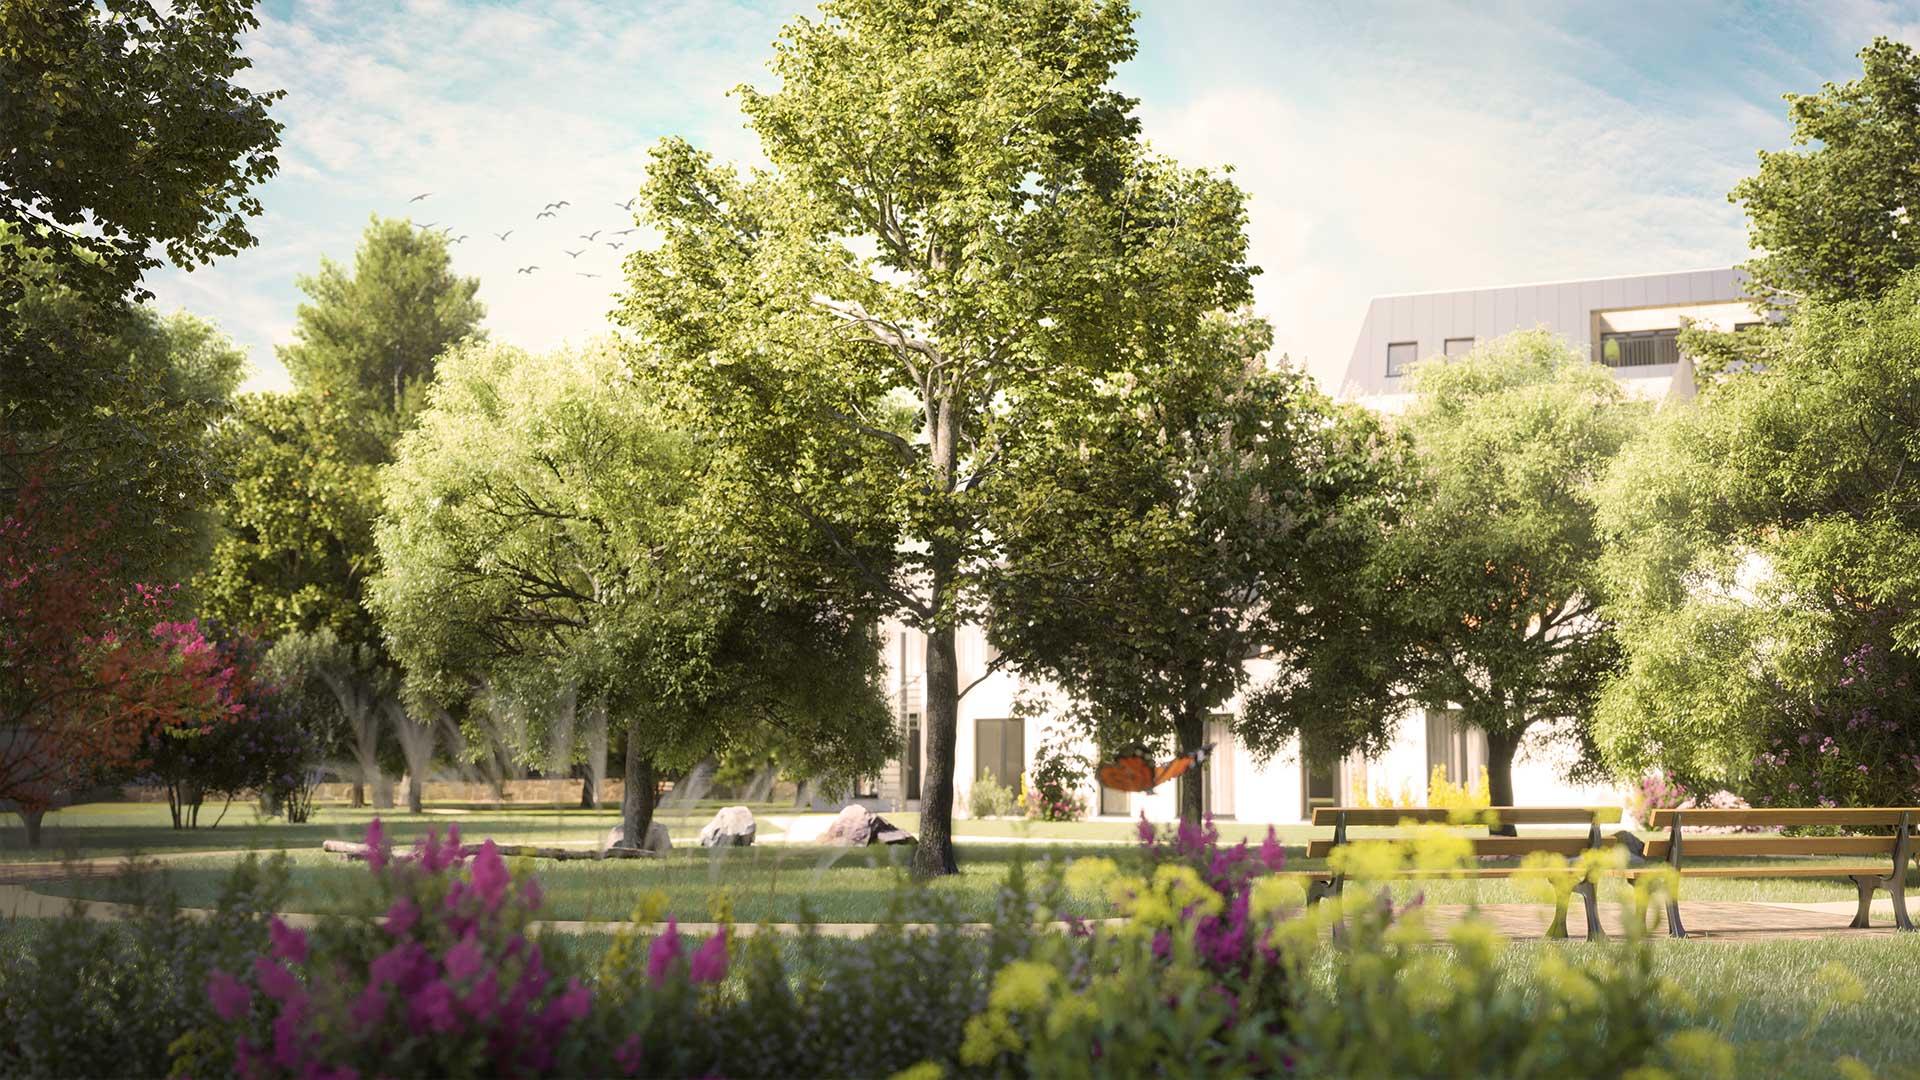 Immobilienmarketing Parkquartier Visualisierung